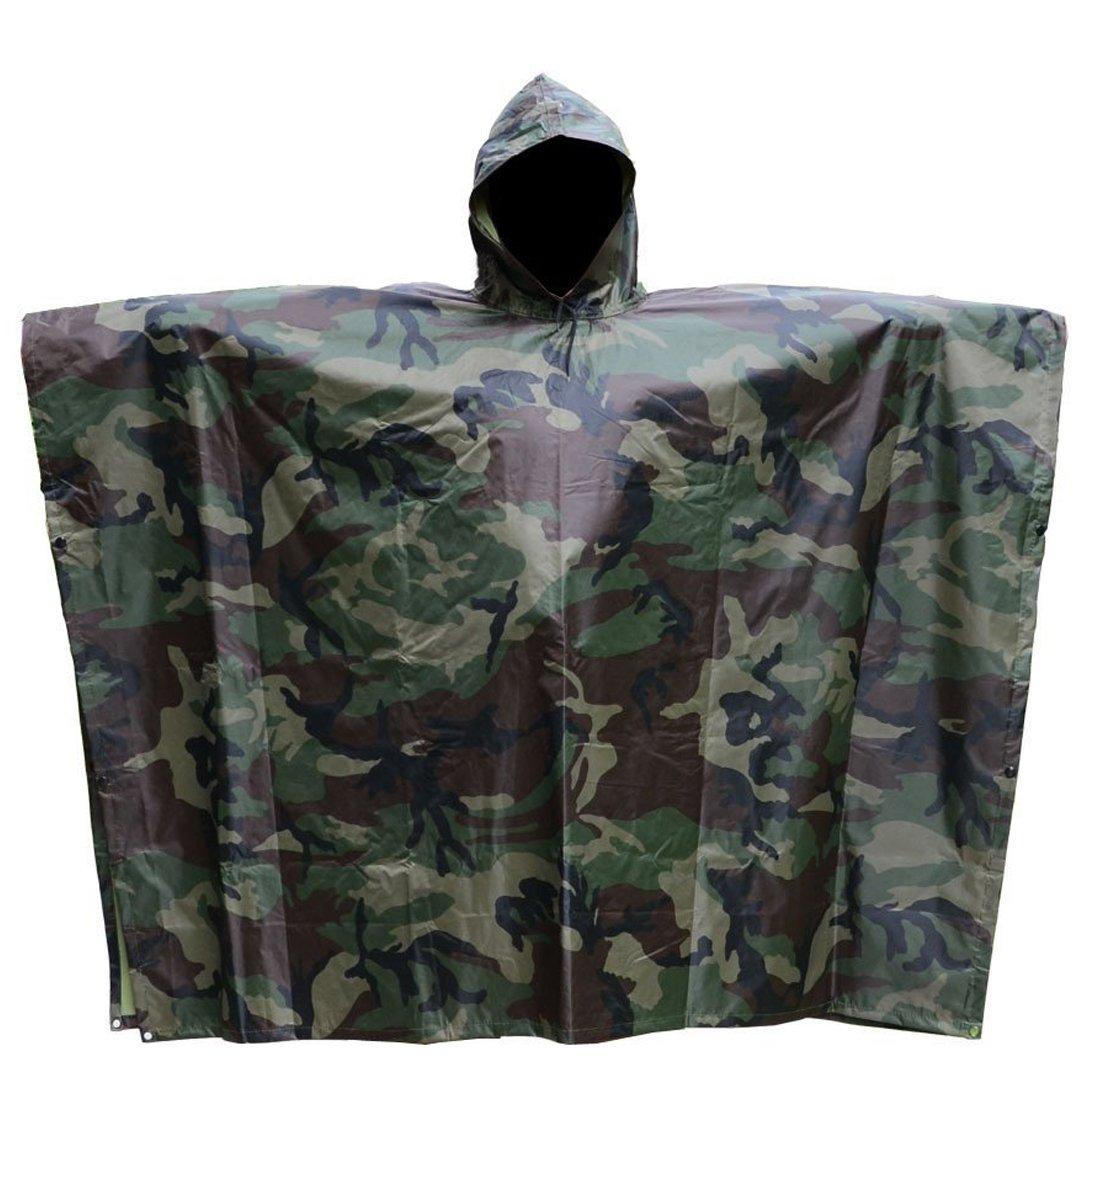 T-wilker 3 in1 Rain Poncho Waterproof Camouflage Ripstop Rain Jacket Batwing-sleeved Rain Coat with Hoods (Camo)